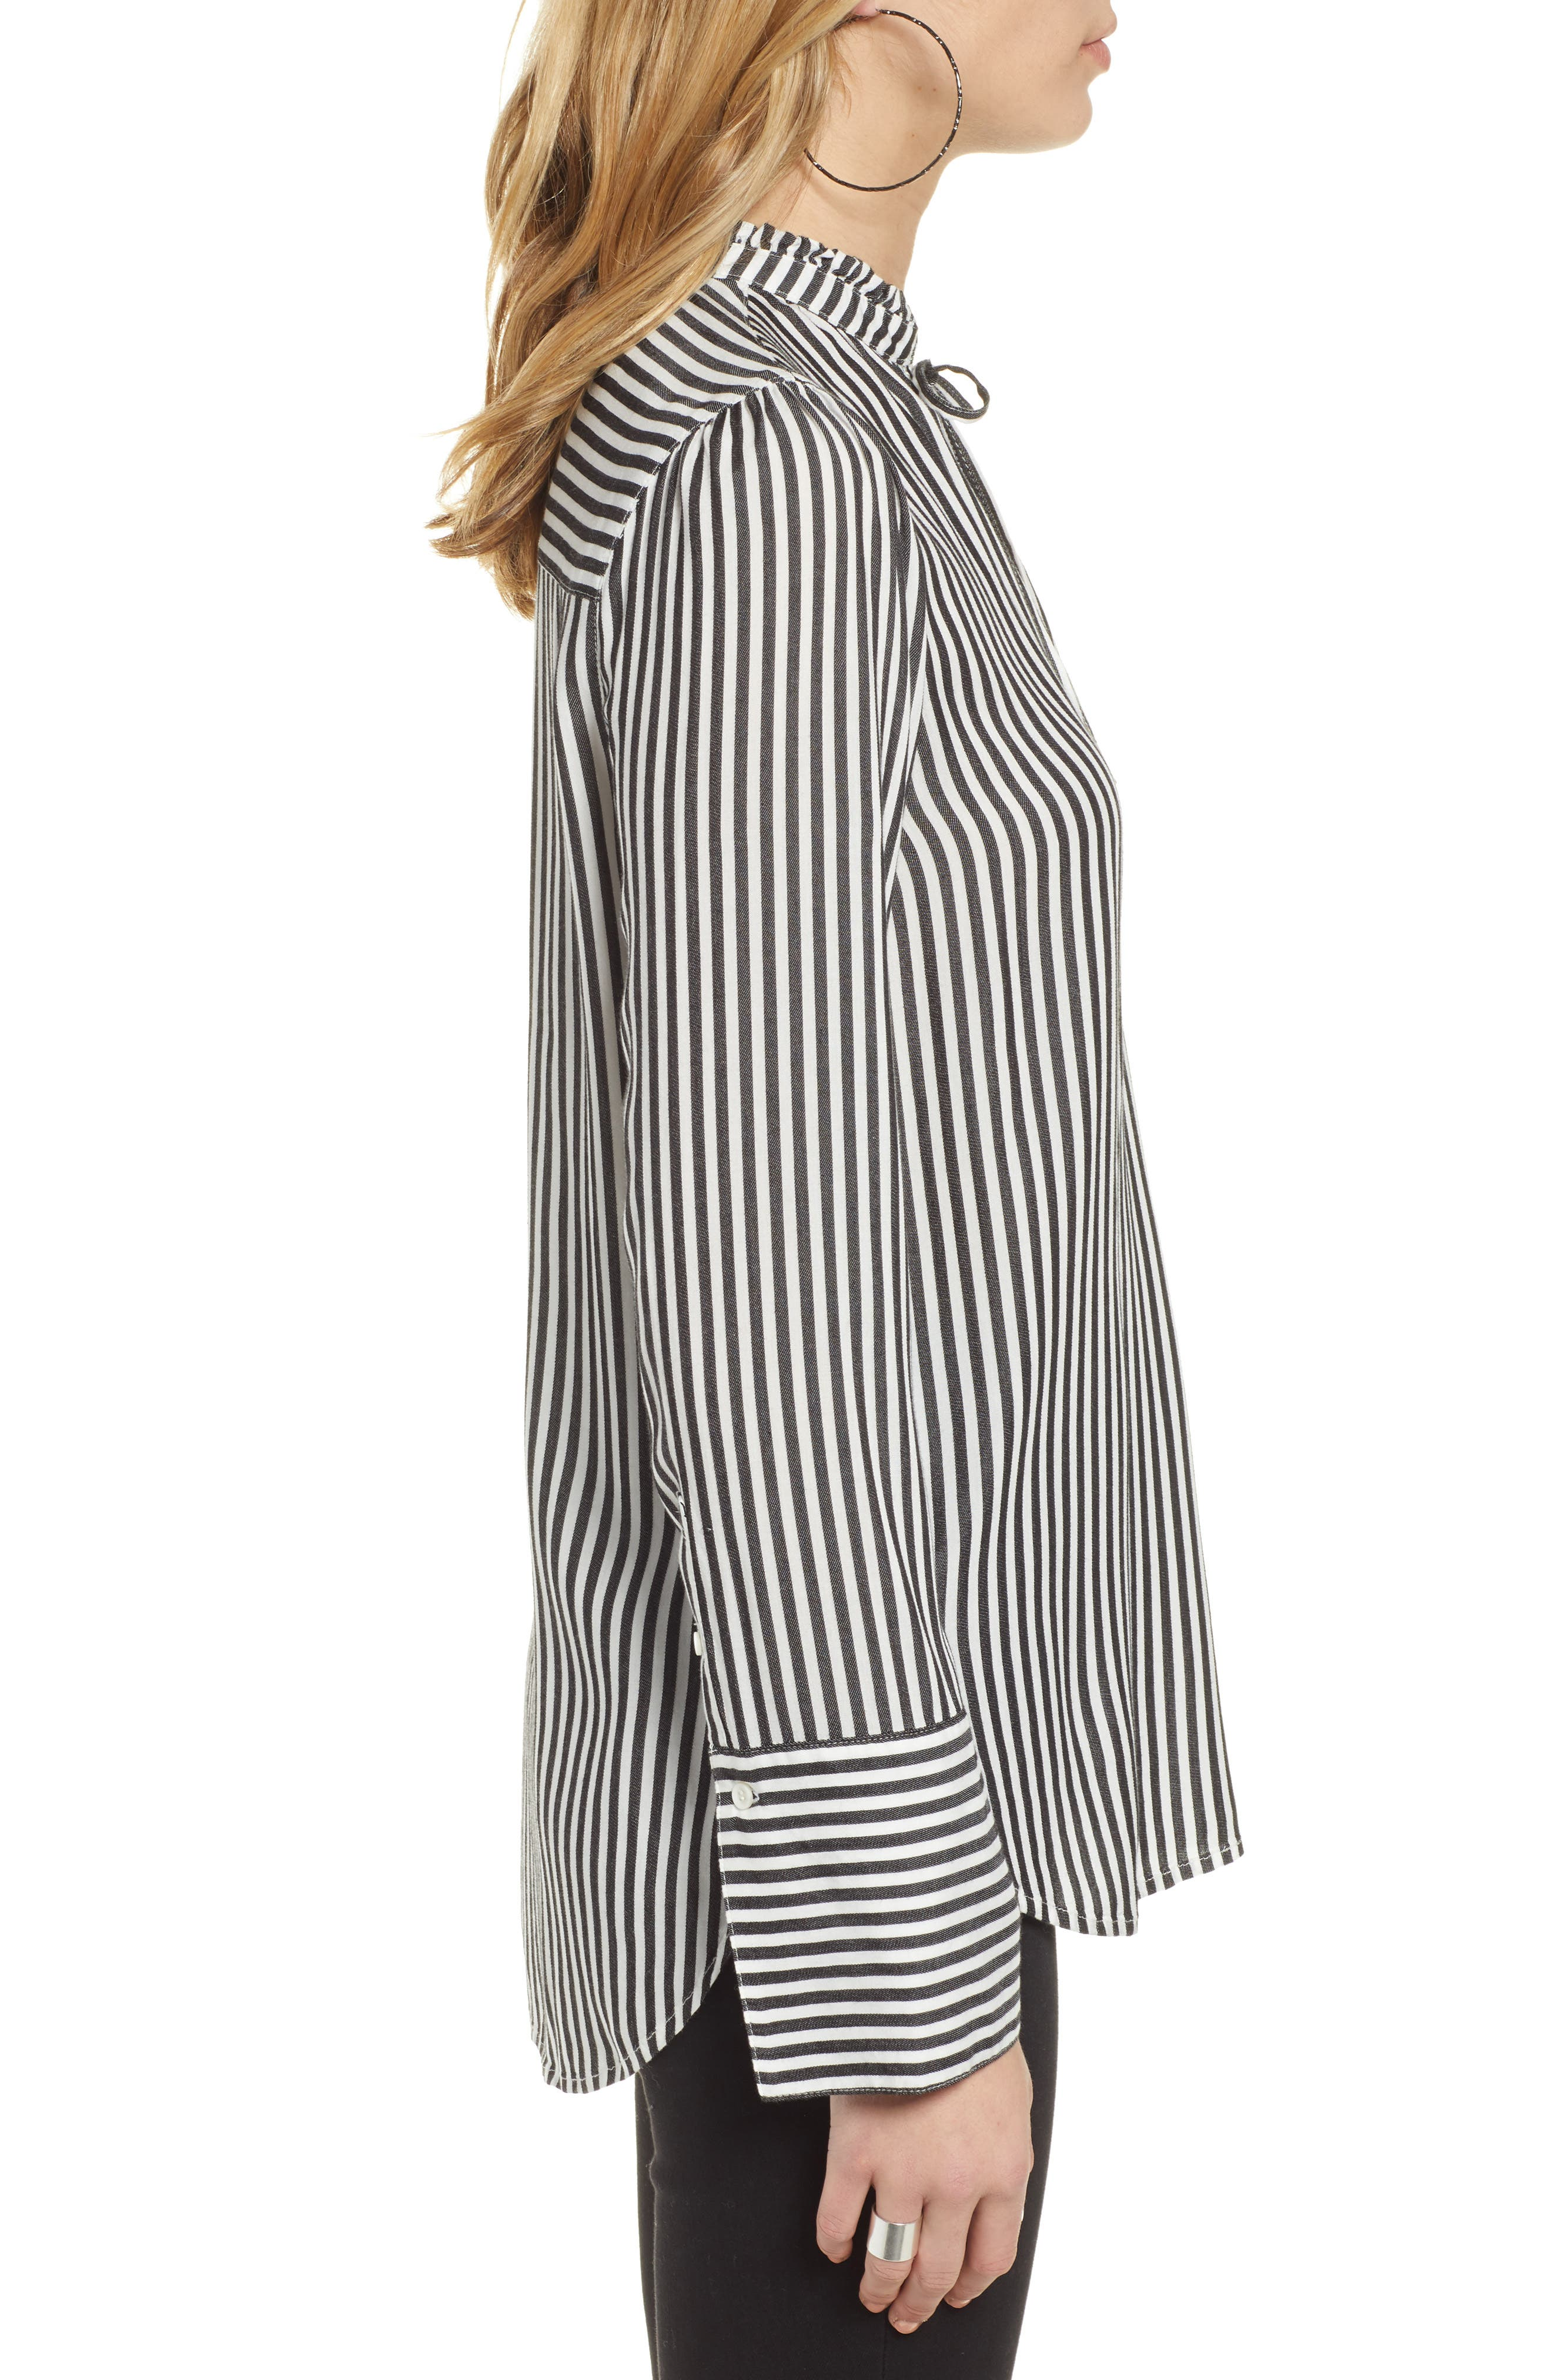 TREASURE & BOND, Stripe Ruffle Neck Shirt, Alternate thumbnail 3, color, BLACK- WHITE SARA STRIPE